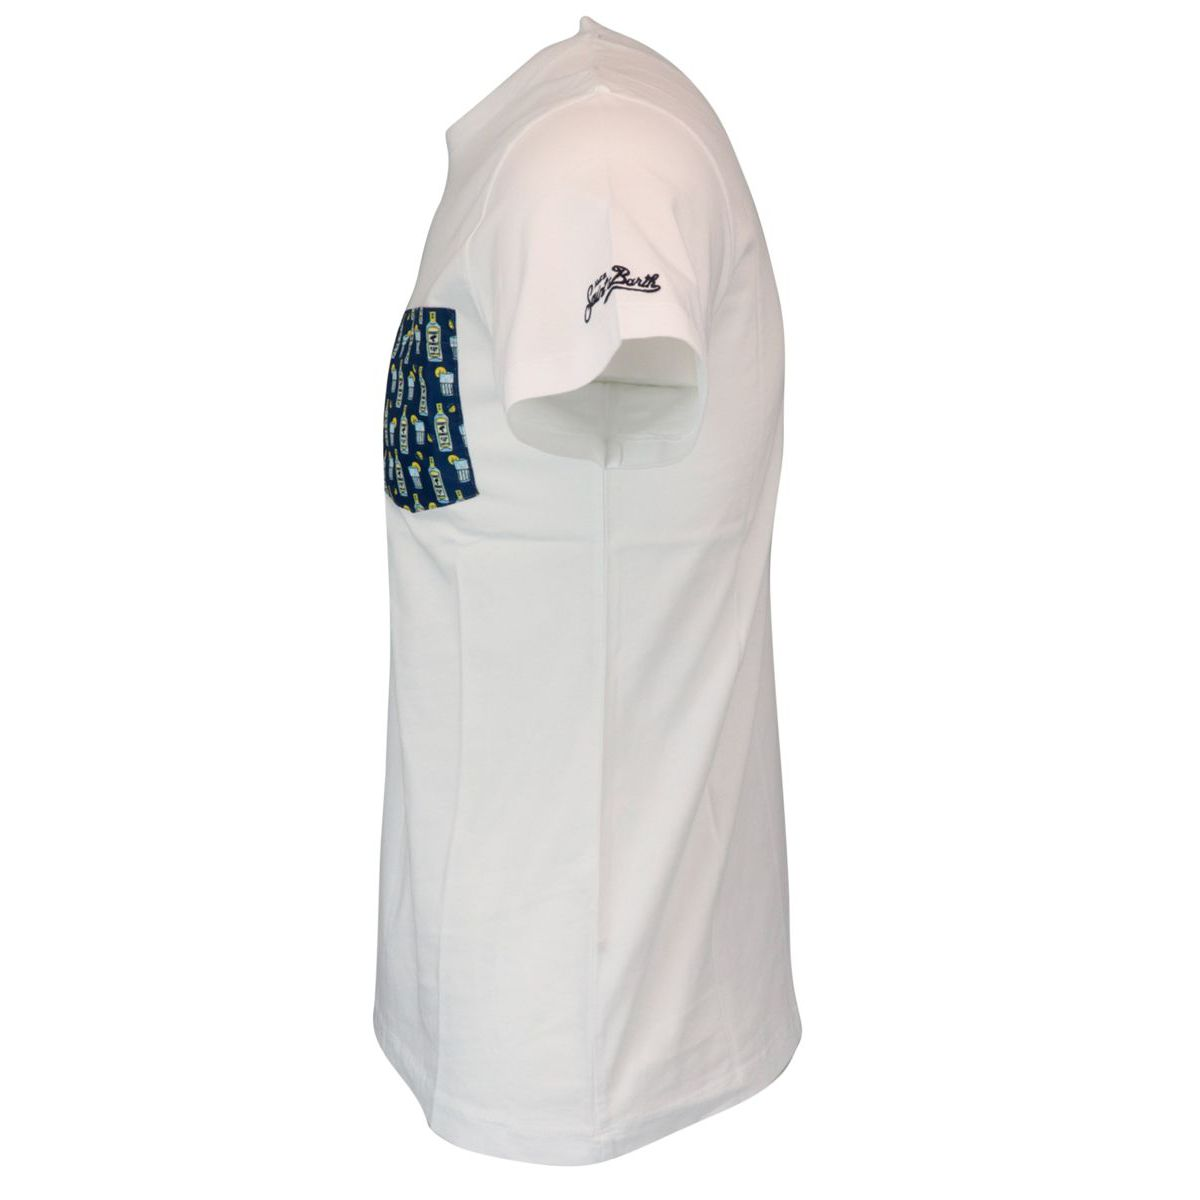 Cotton T-shirt 01 GINX 61 White MC2 Saint Barth